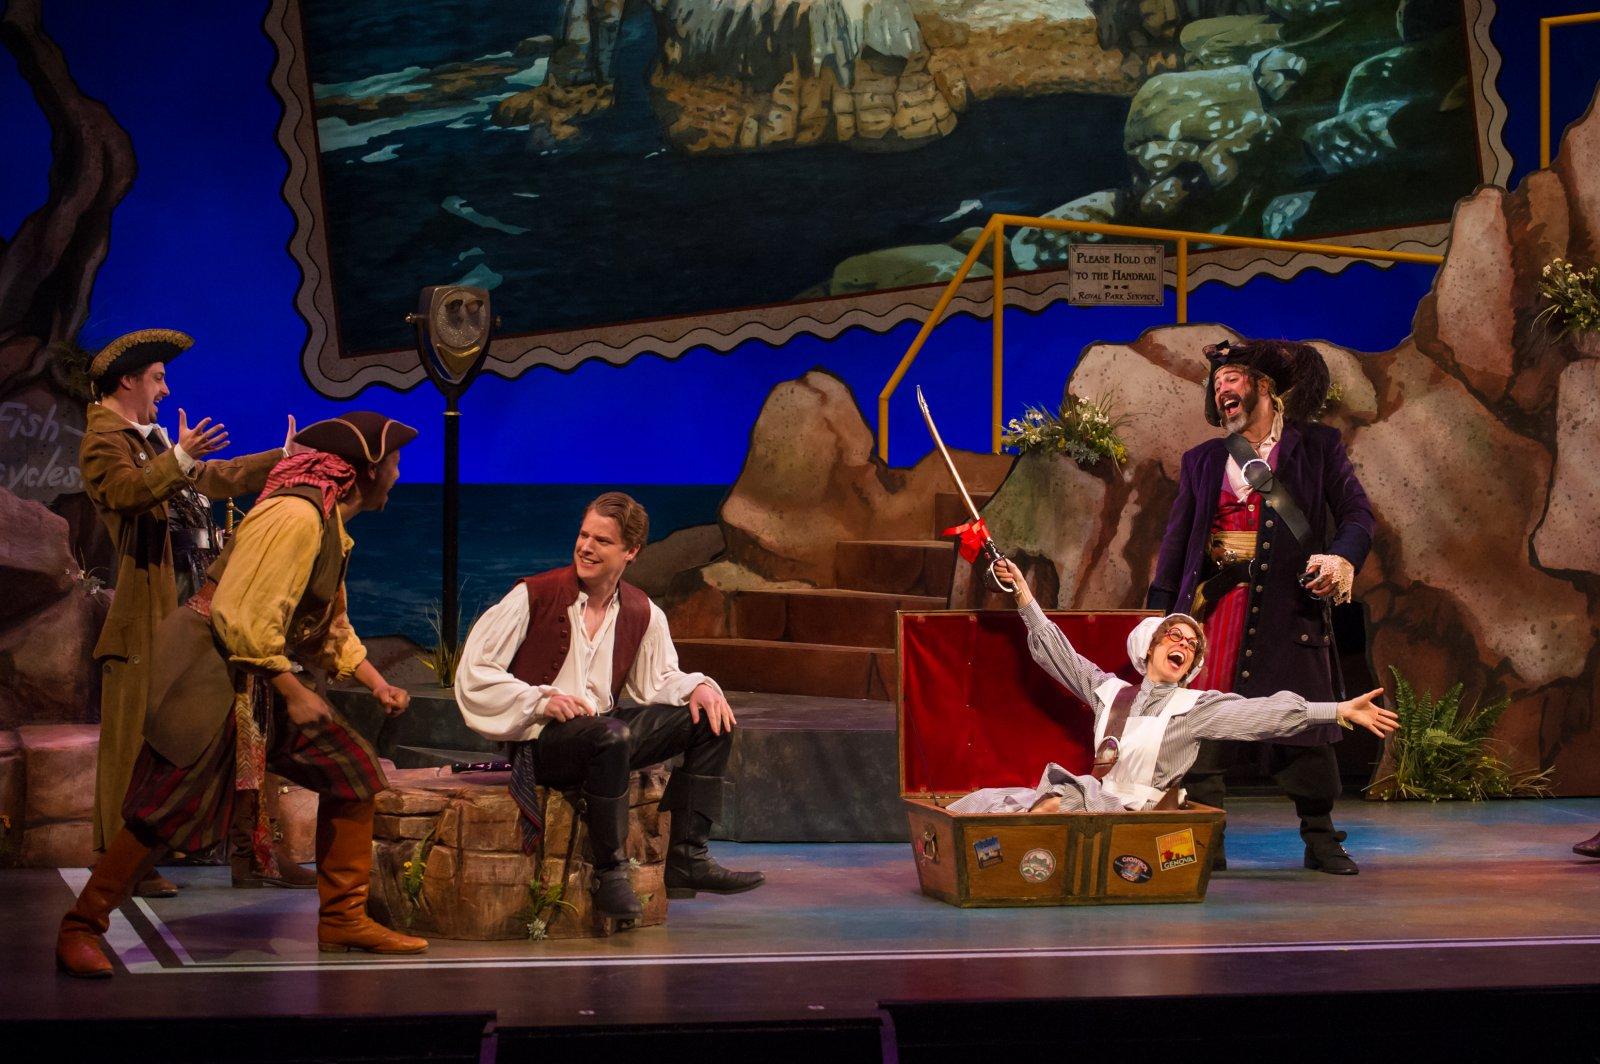 Tim Rebers (Ensemble), Sean Jackson (Ensemble), Benjamin Robinson (Frederick), Diane Lane (Ruth), and Andrew Varela (Pirate King) of Pirates of Penzance